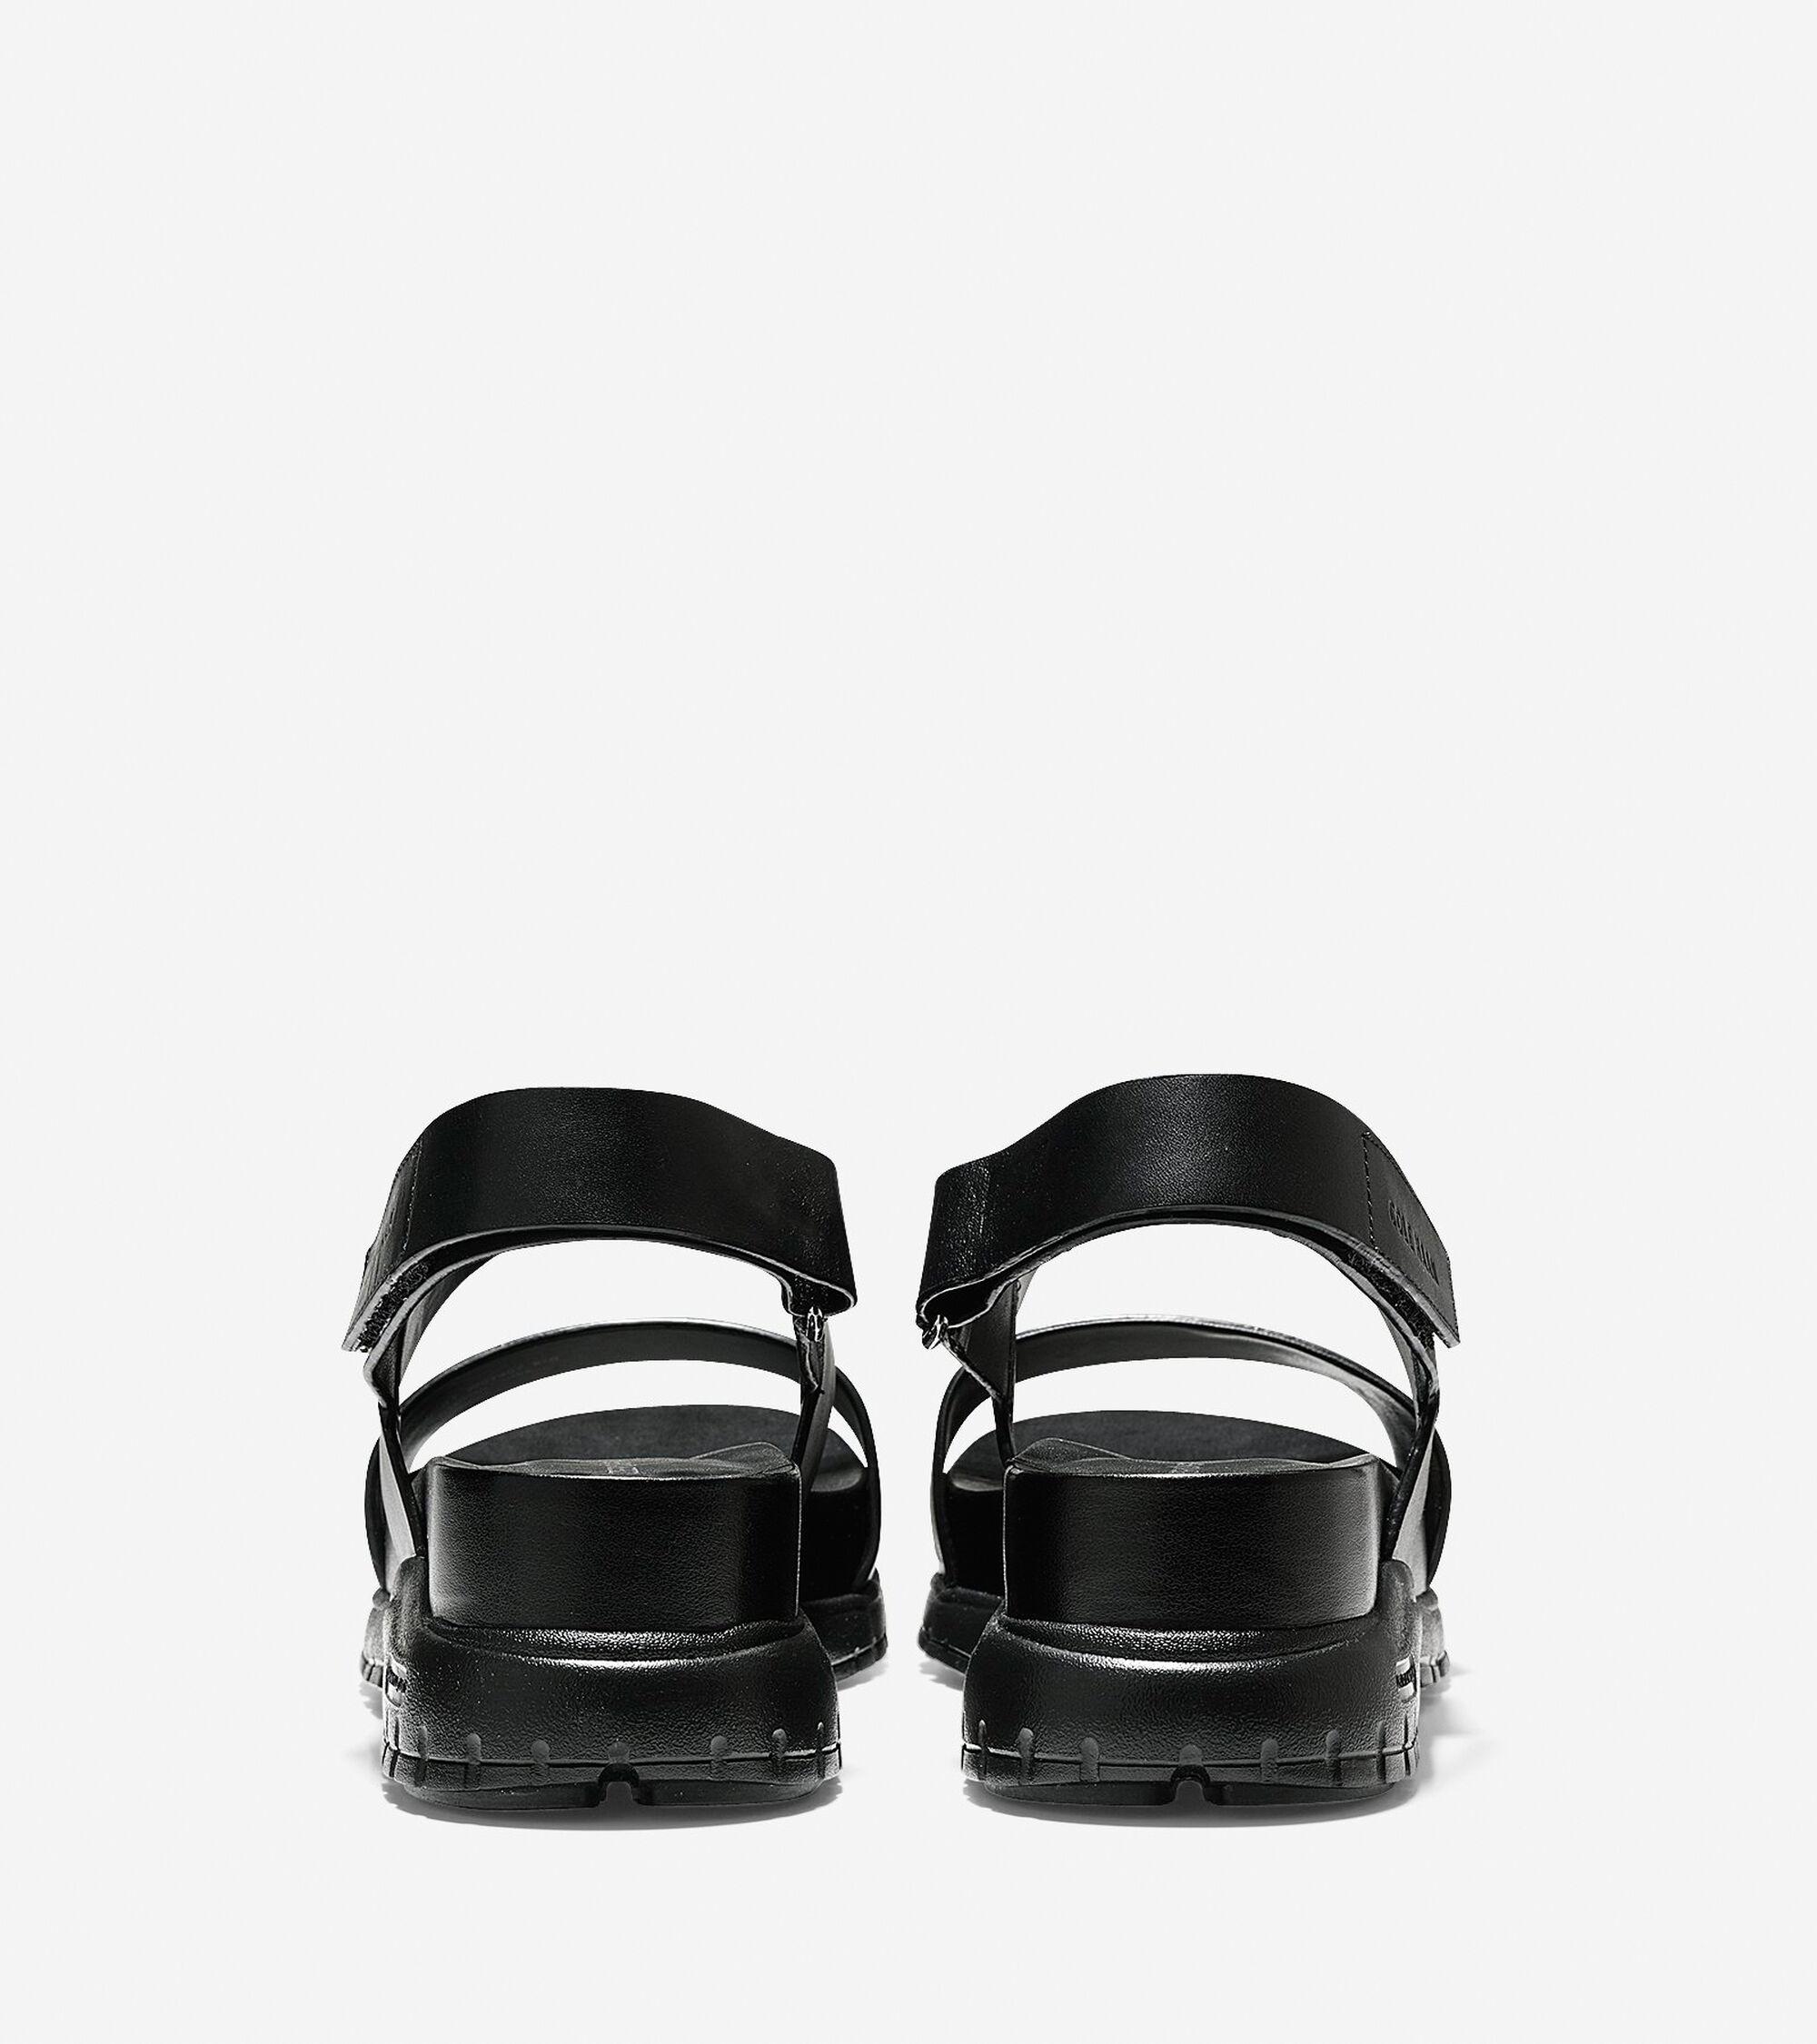 72909dddf3 Women's ZEROGRAND Slide Sandals in Black | Cole Haan